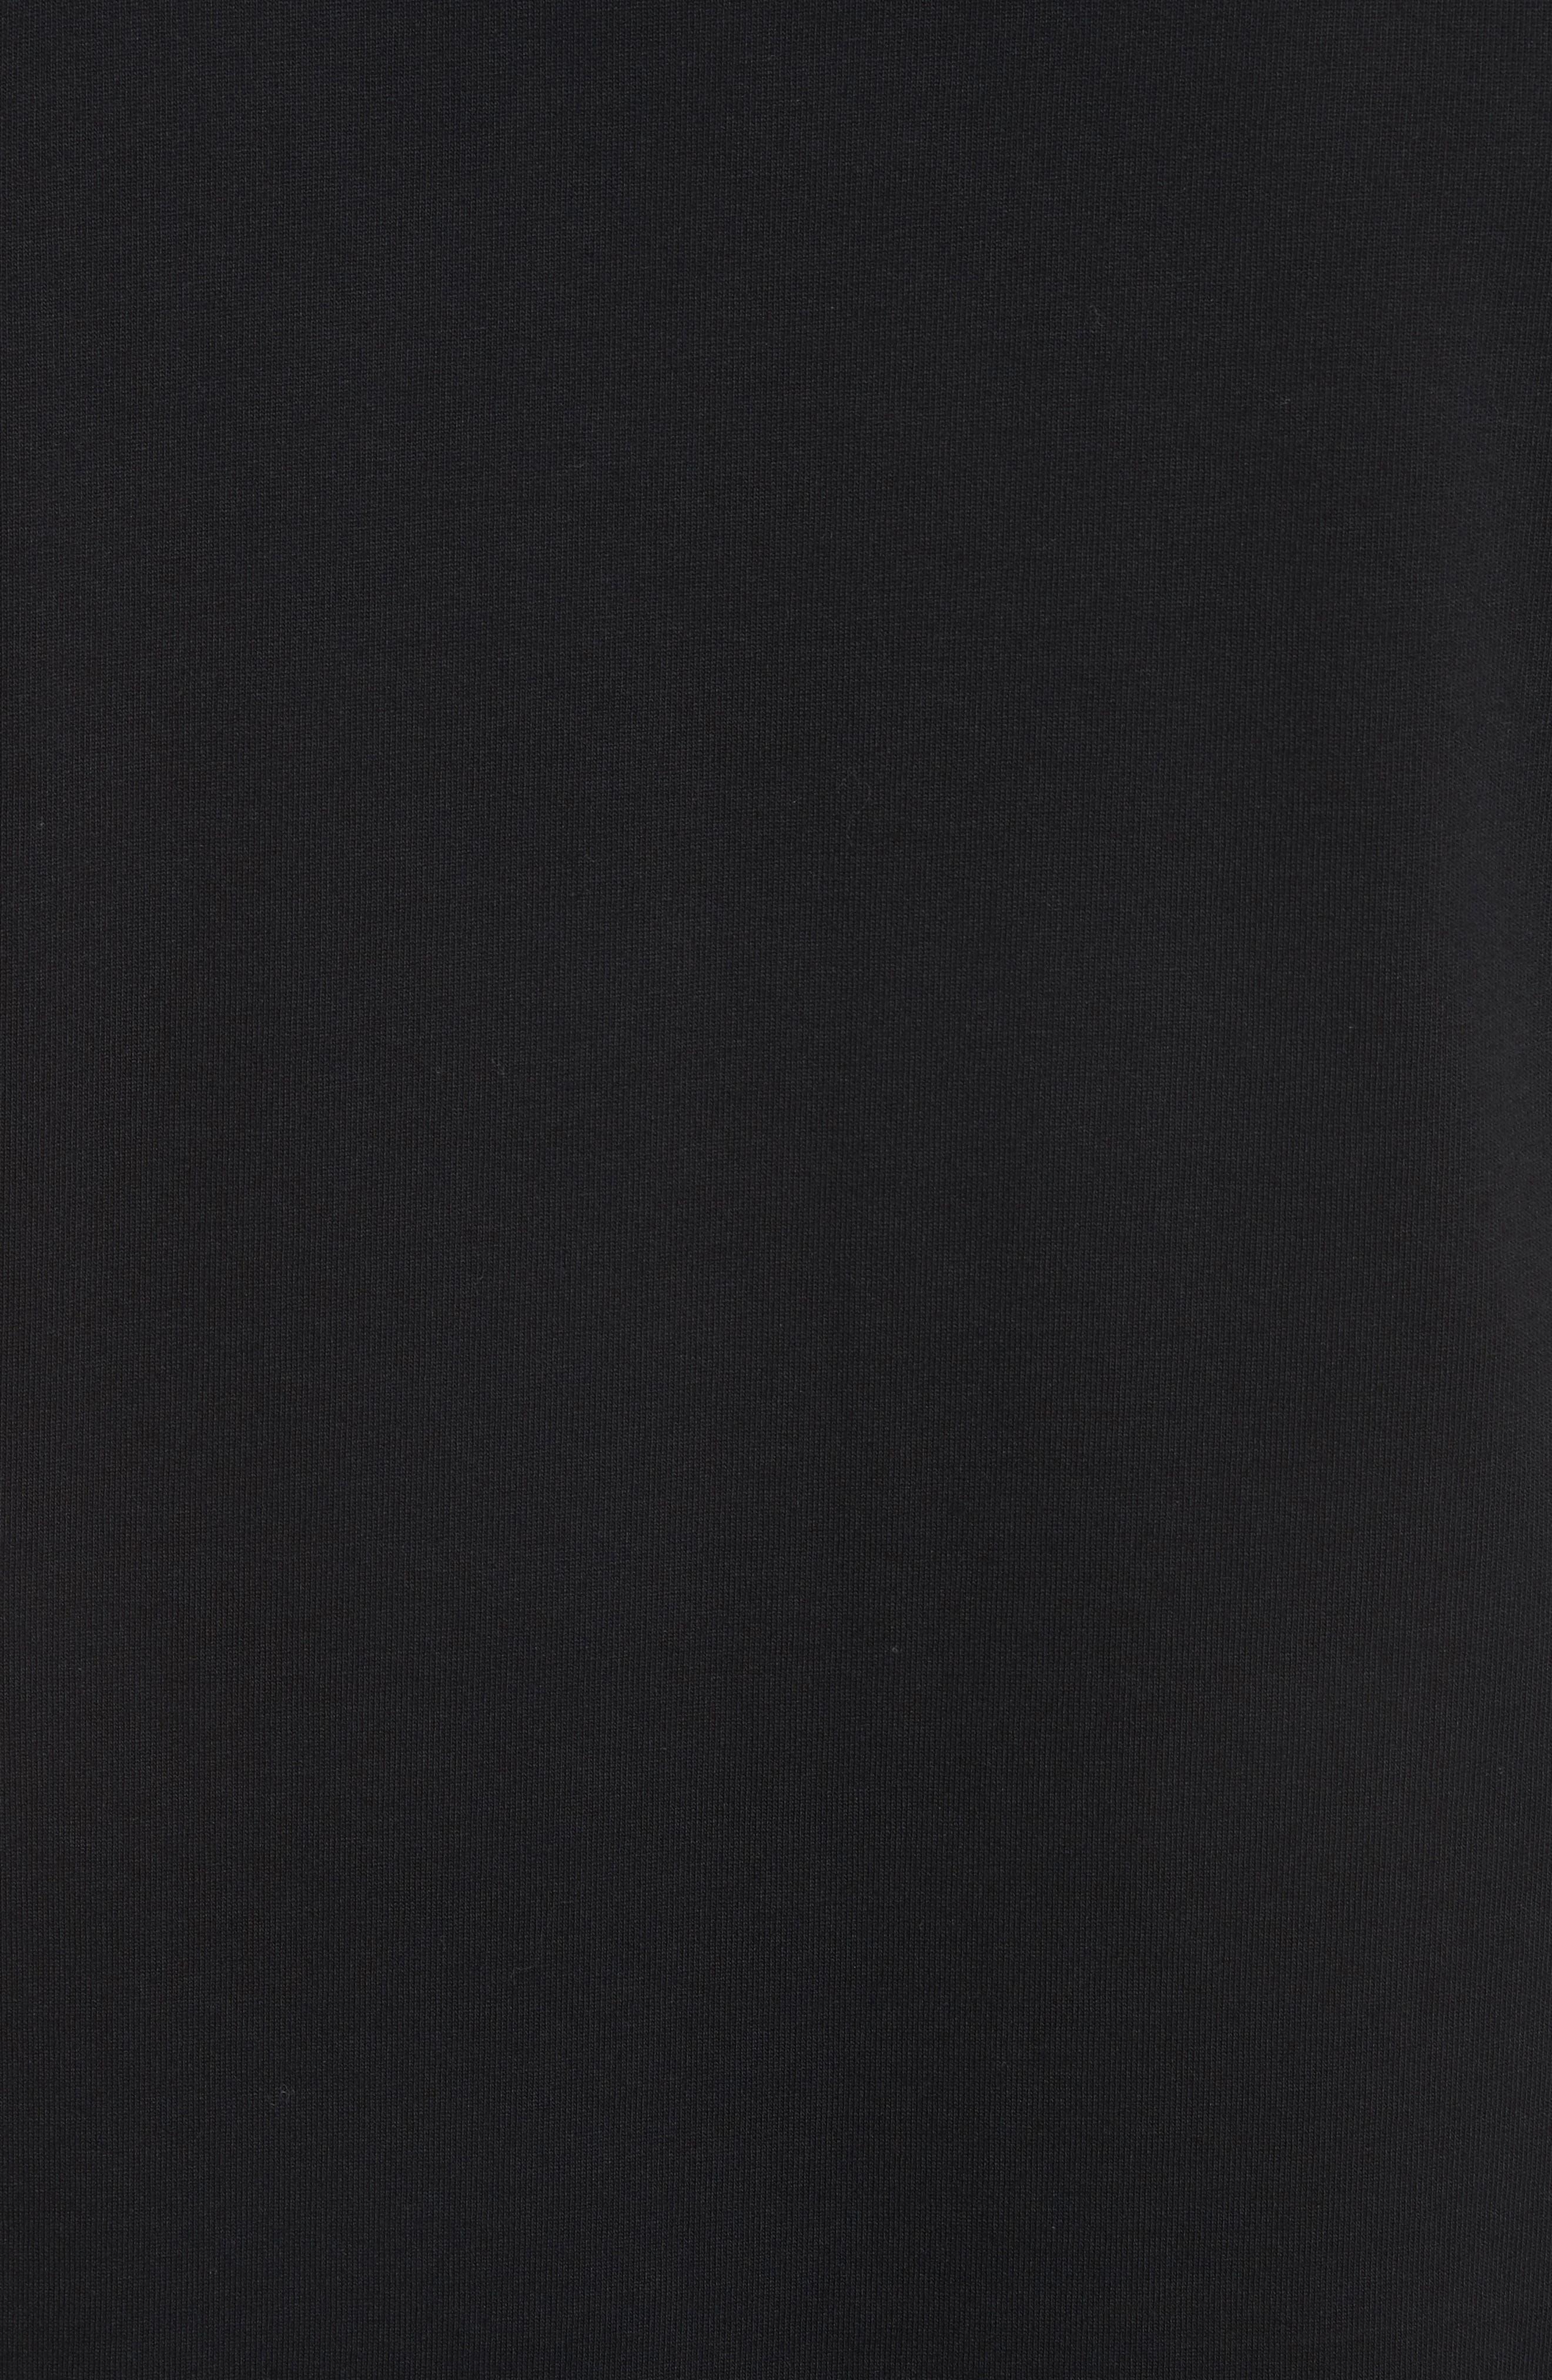 Pinstripe Pocket T-Shirt,                             Alternate thumbnail 5, color,